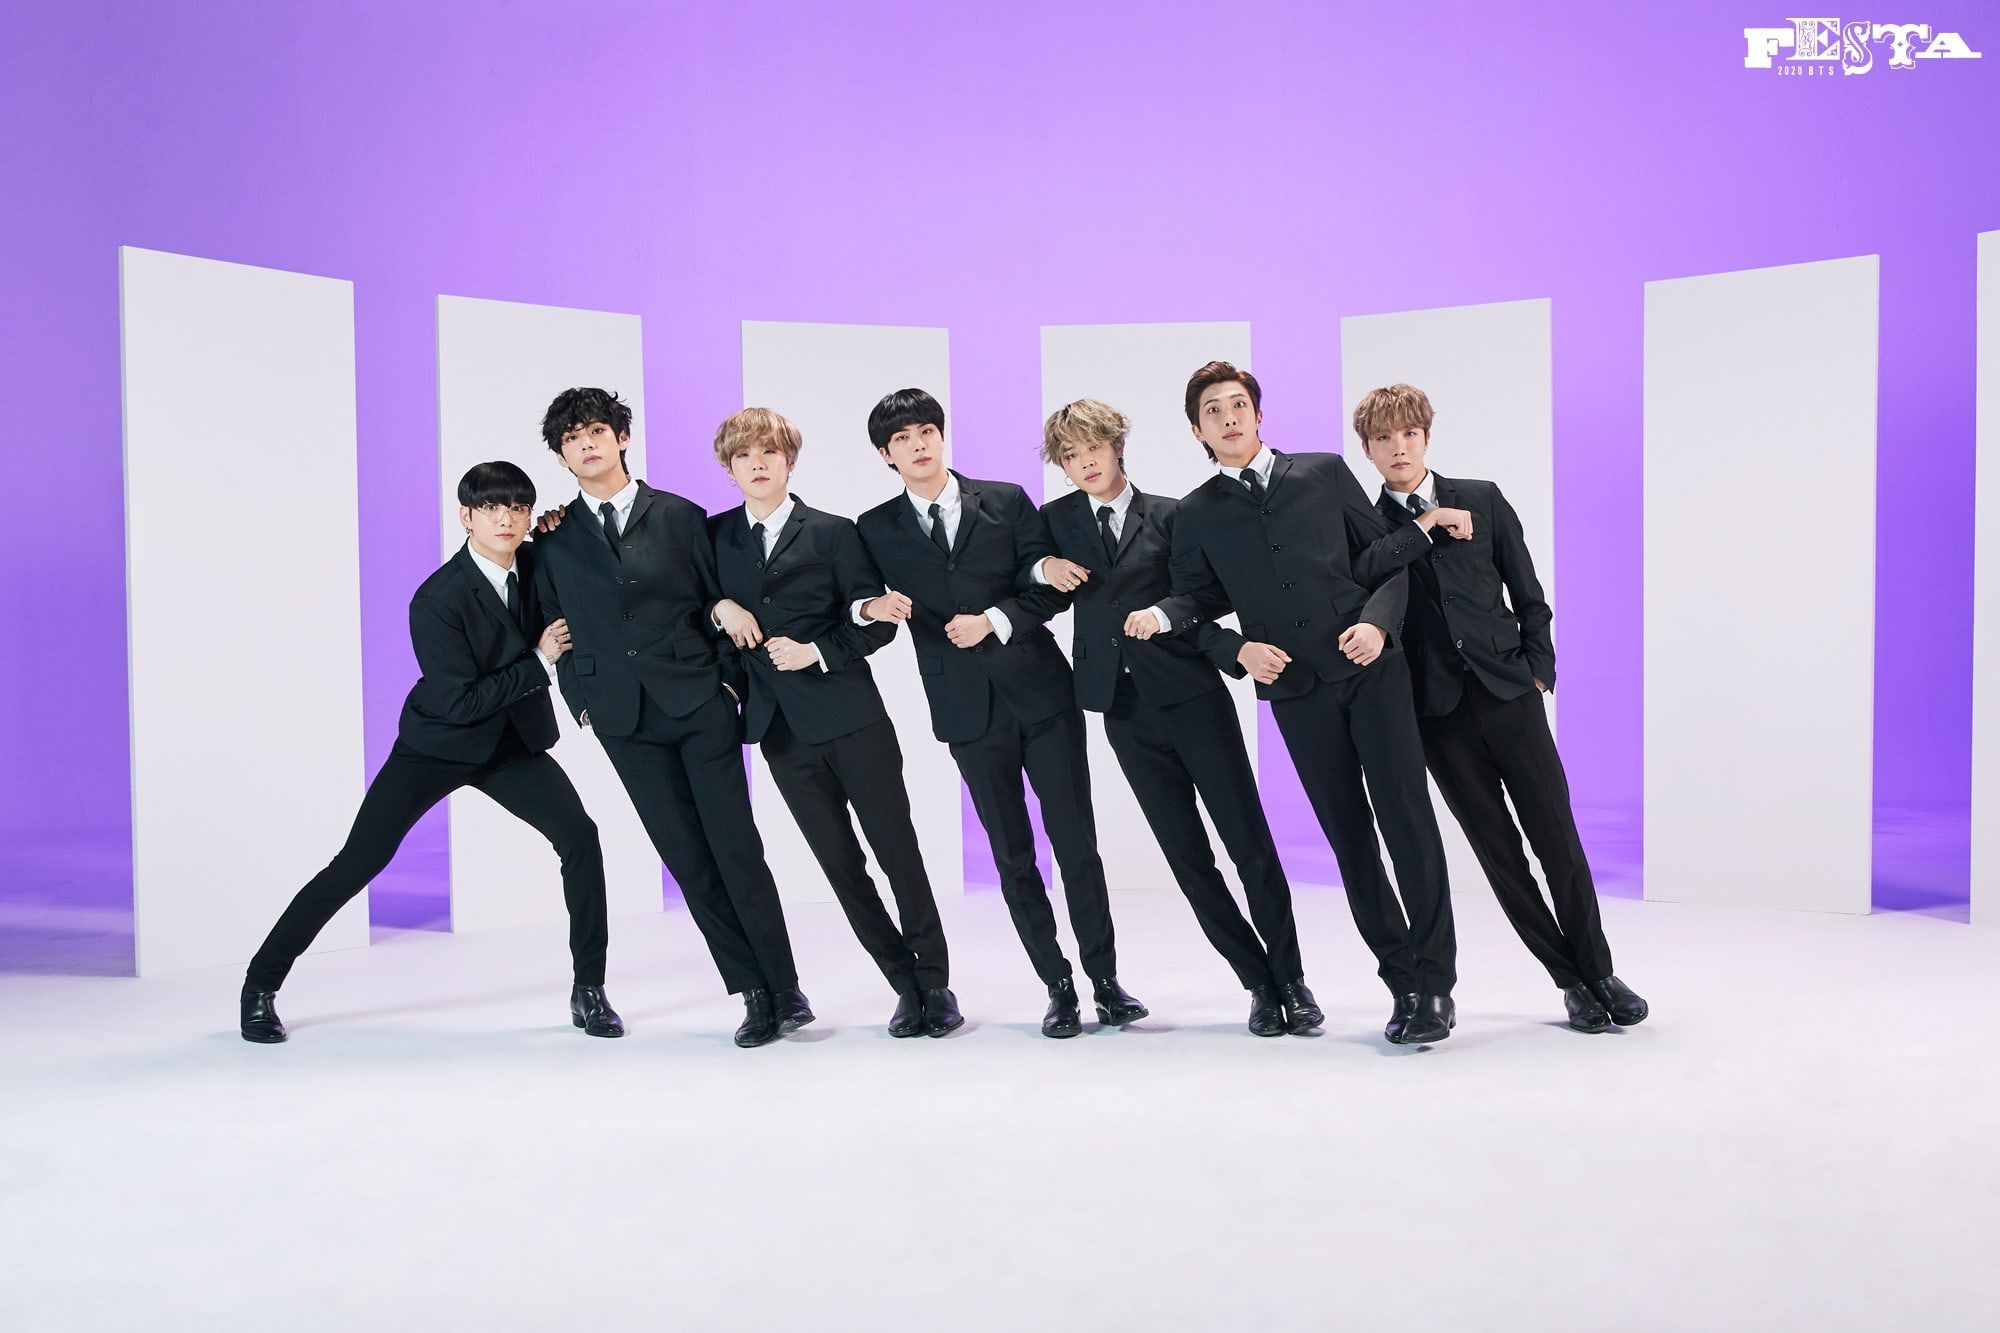 Update: BTS Reveals More Fun Family Portraits For 2020 BTS Festa